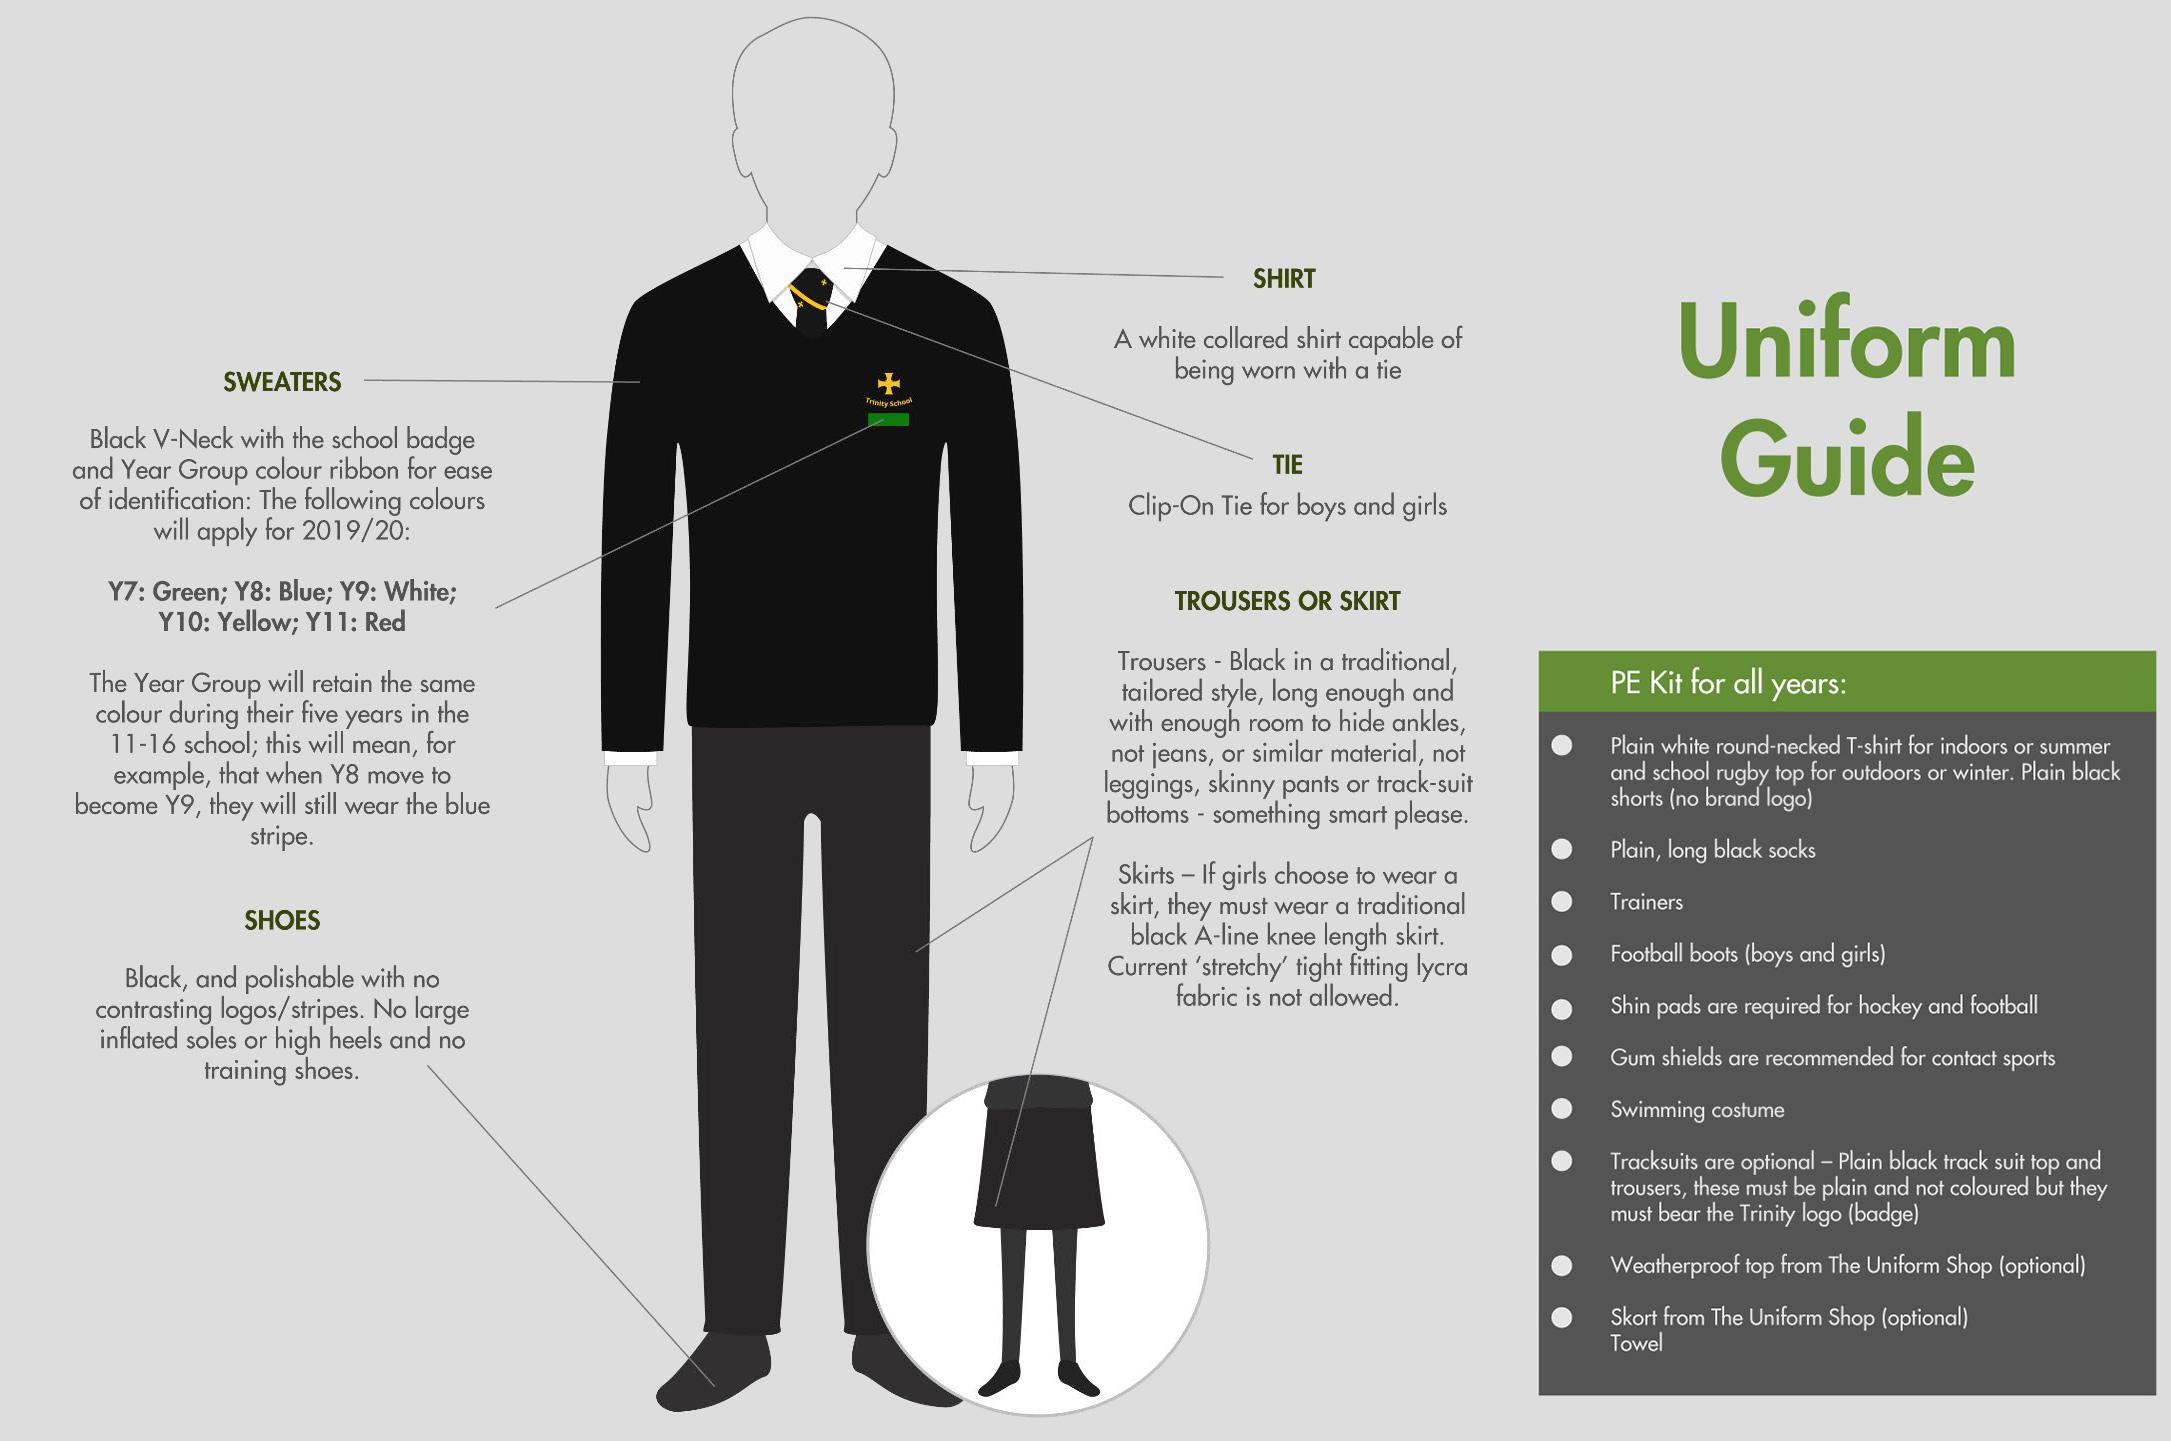 uniform-image-update